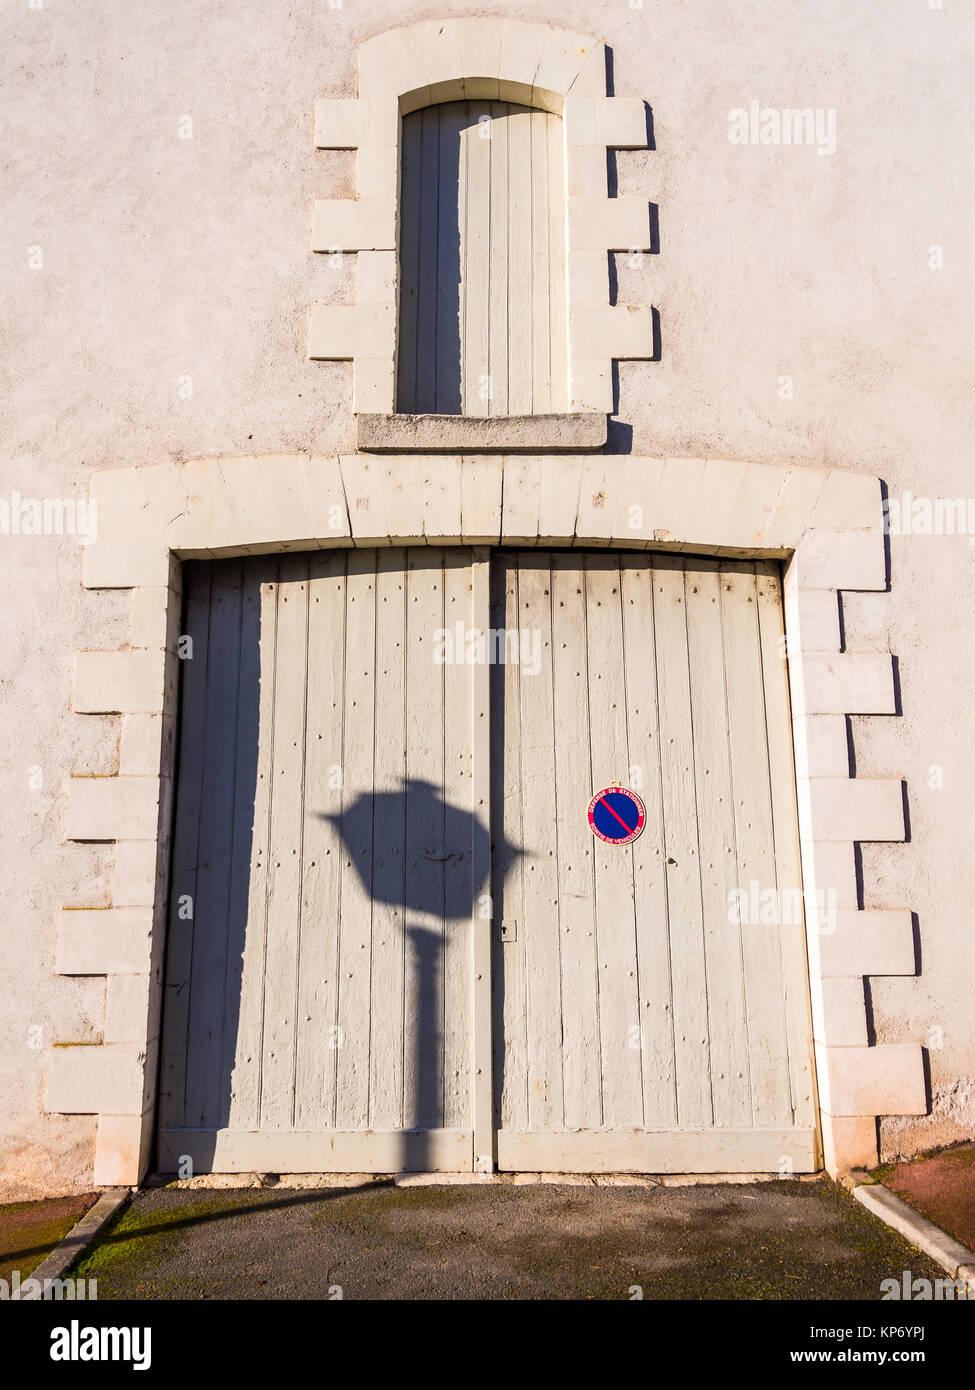 Shadow of street lamp on garage doors - France. - Stock Image